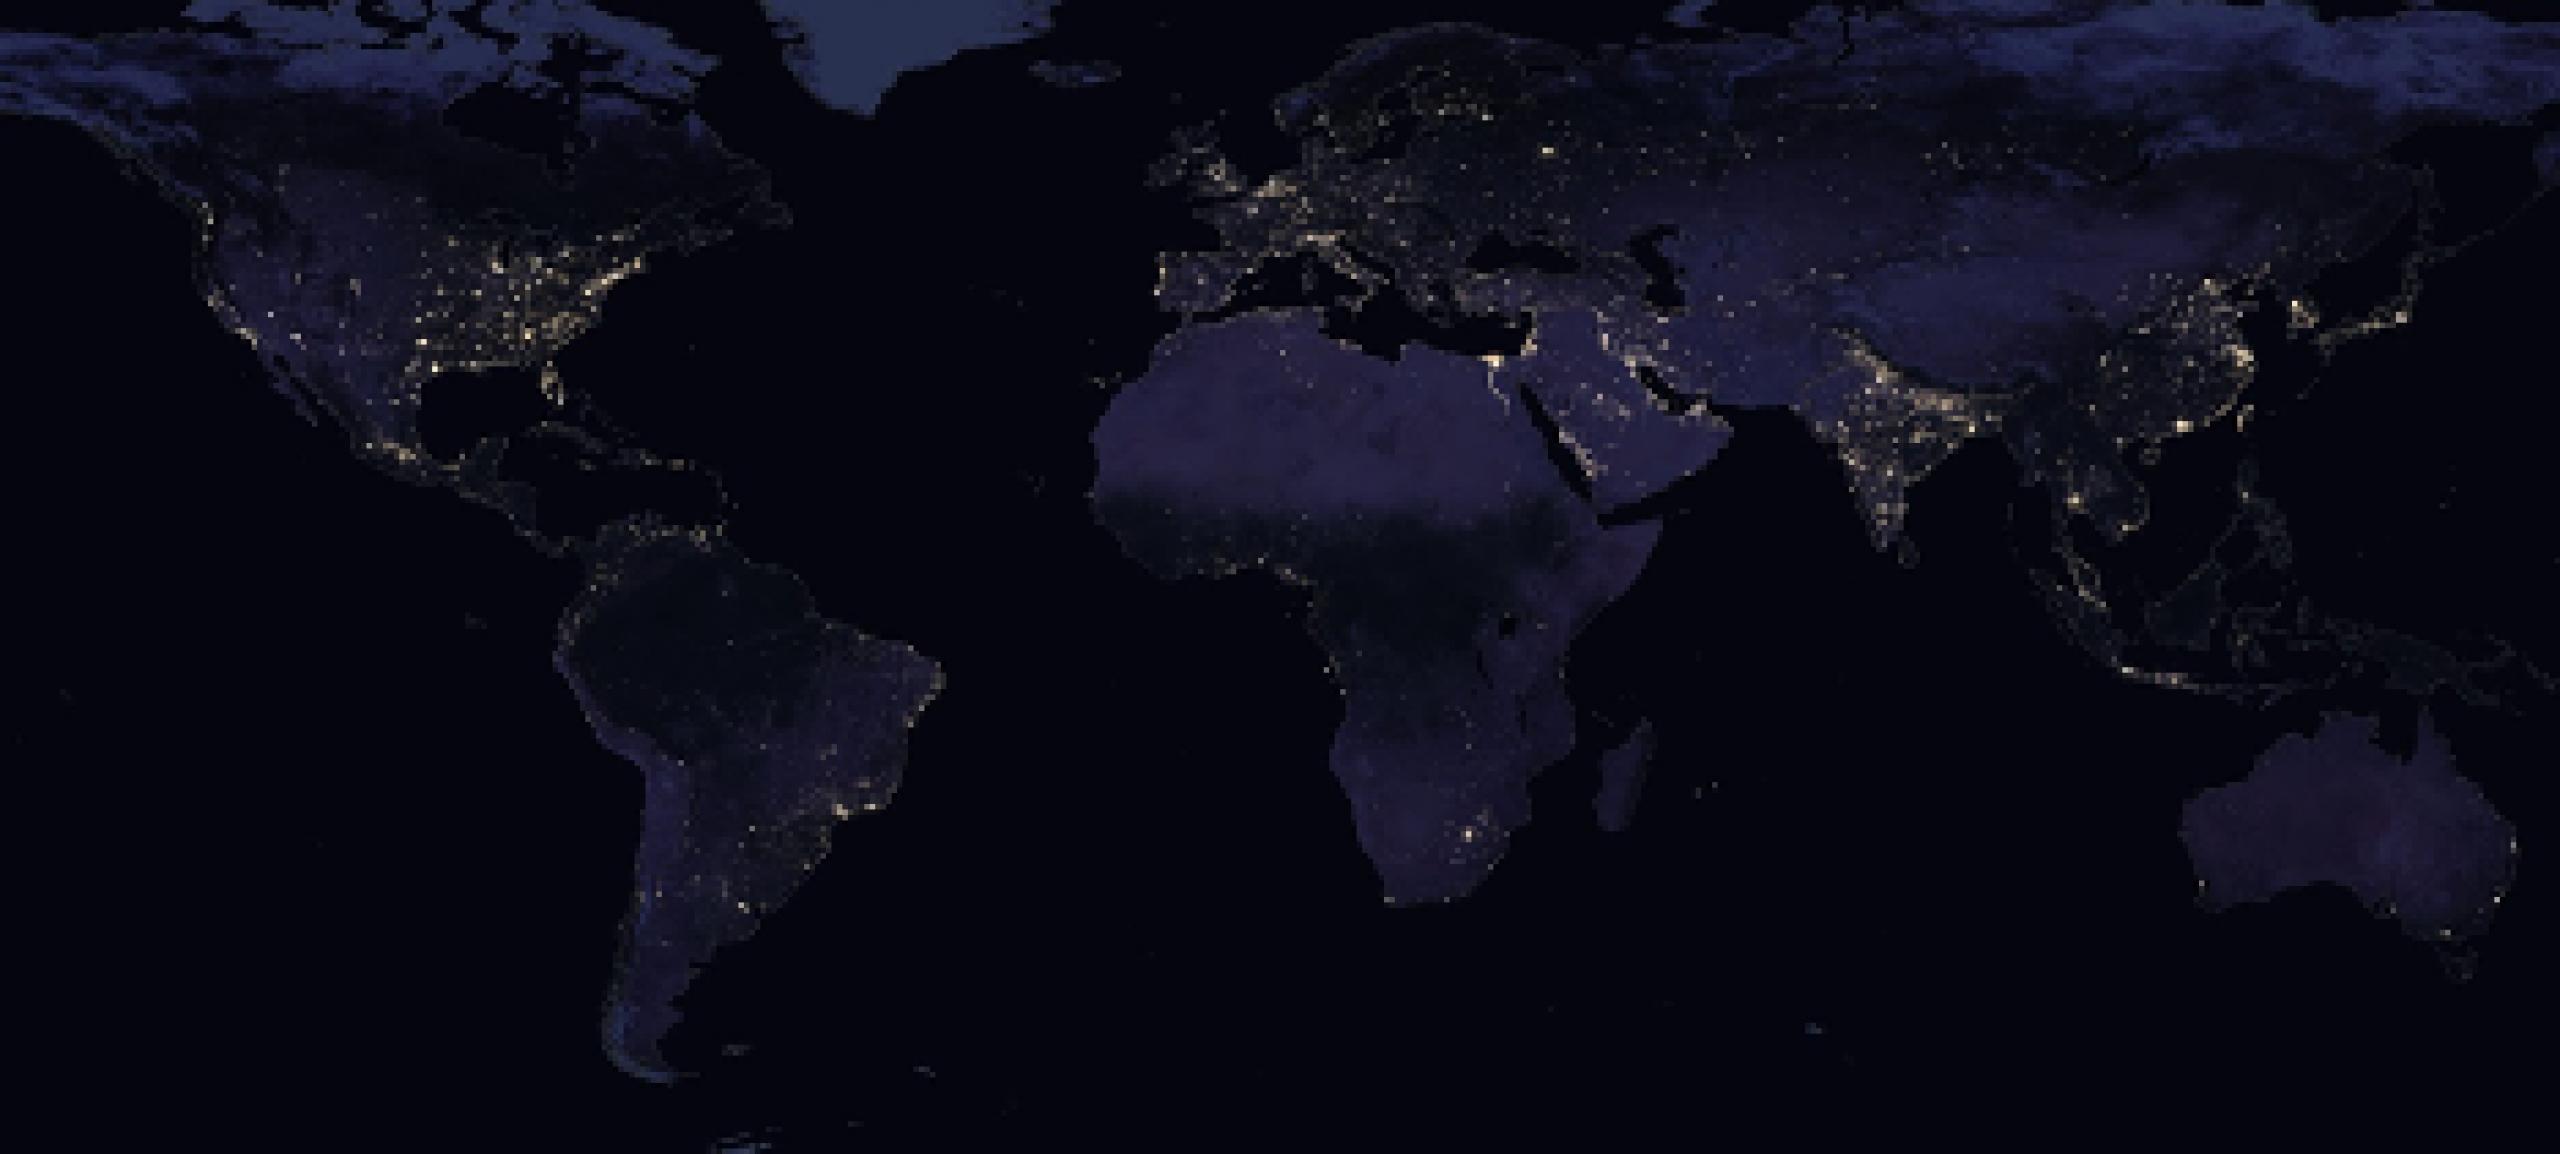 World map at night with lights illuminating